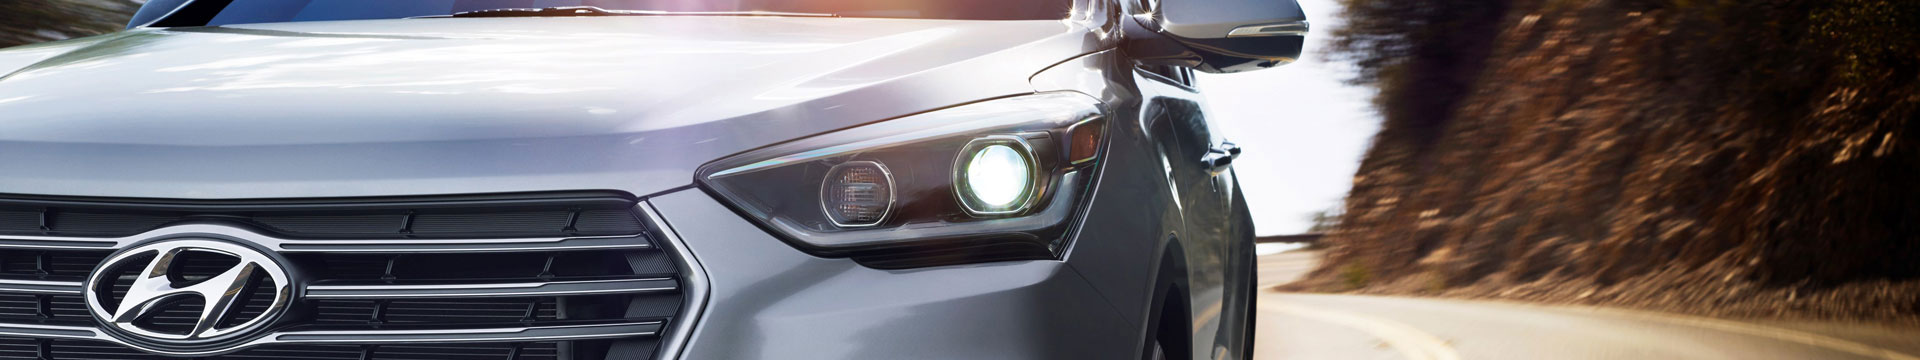 Hyundai Headlight Restoration Service; Hyundai Service Downey, CA